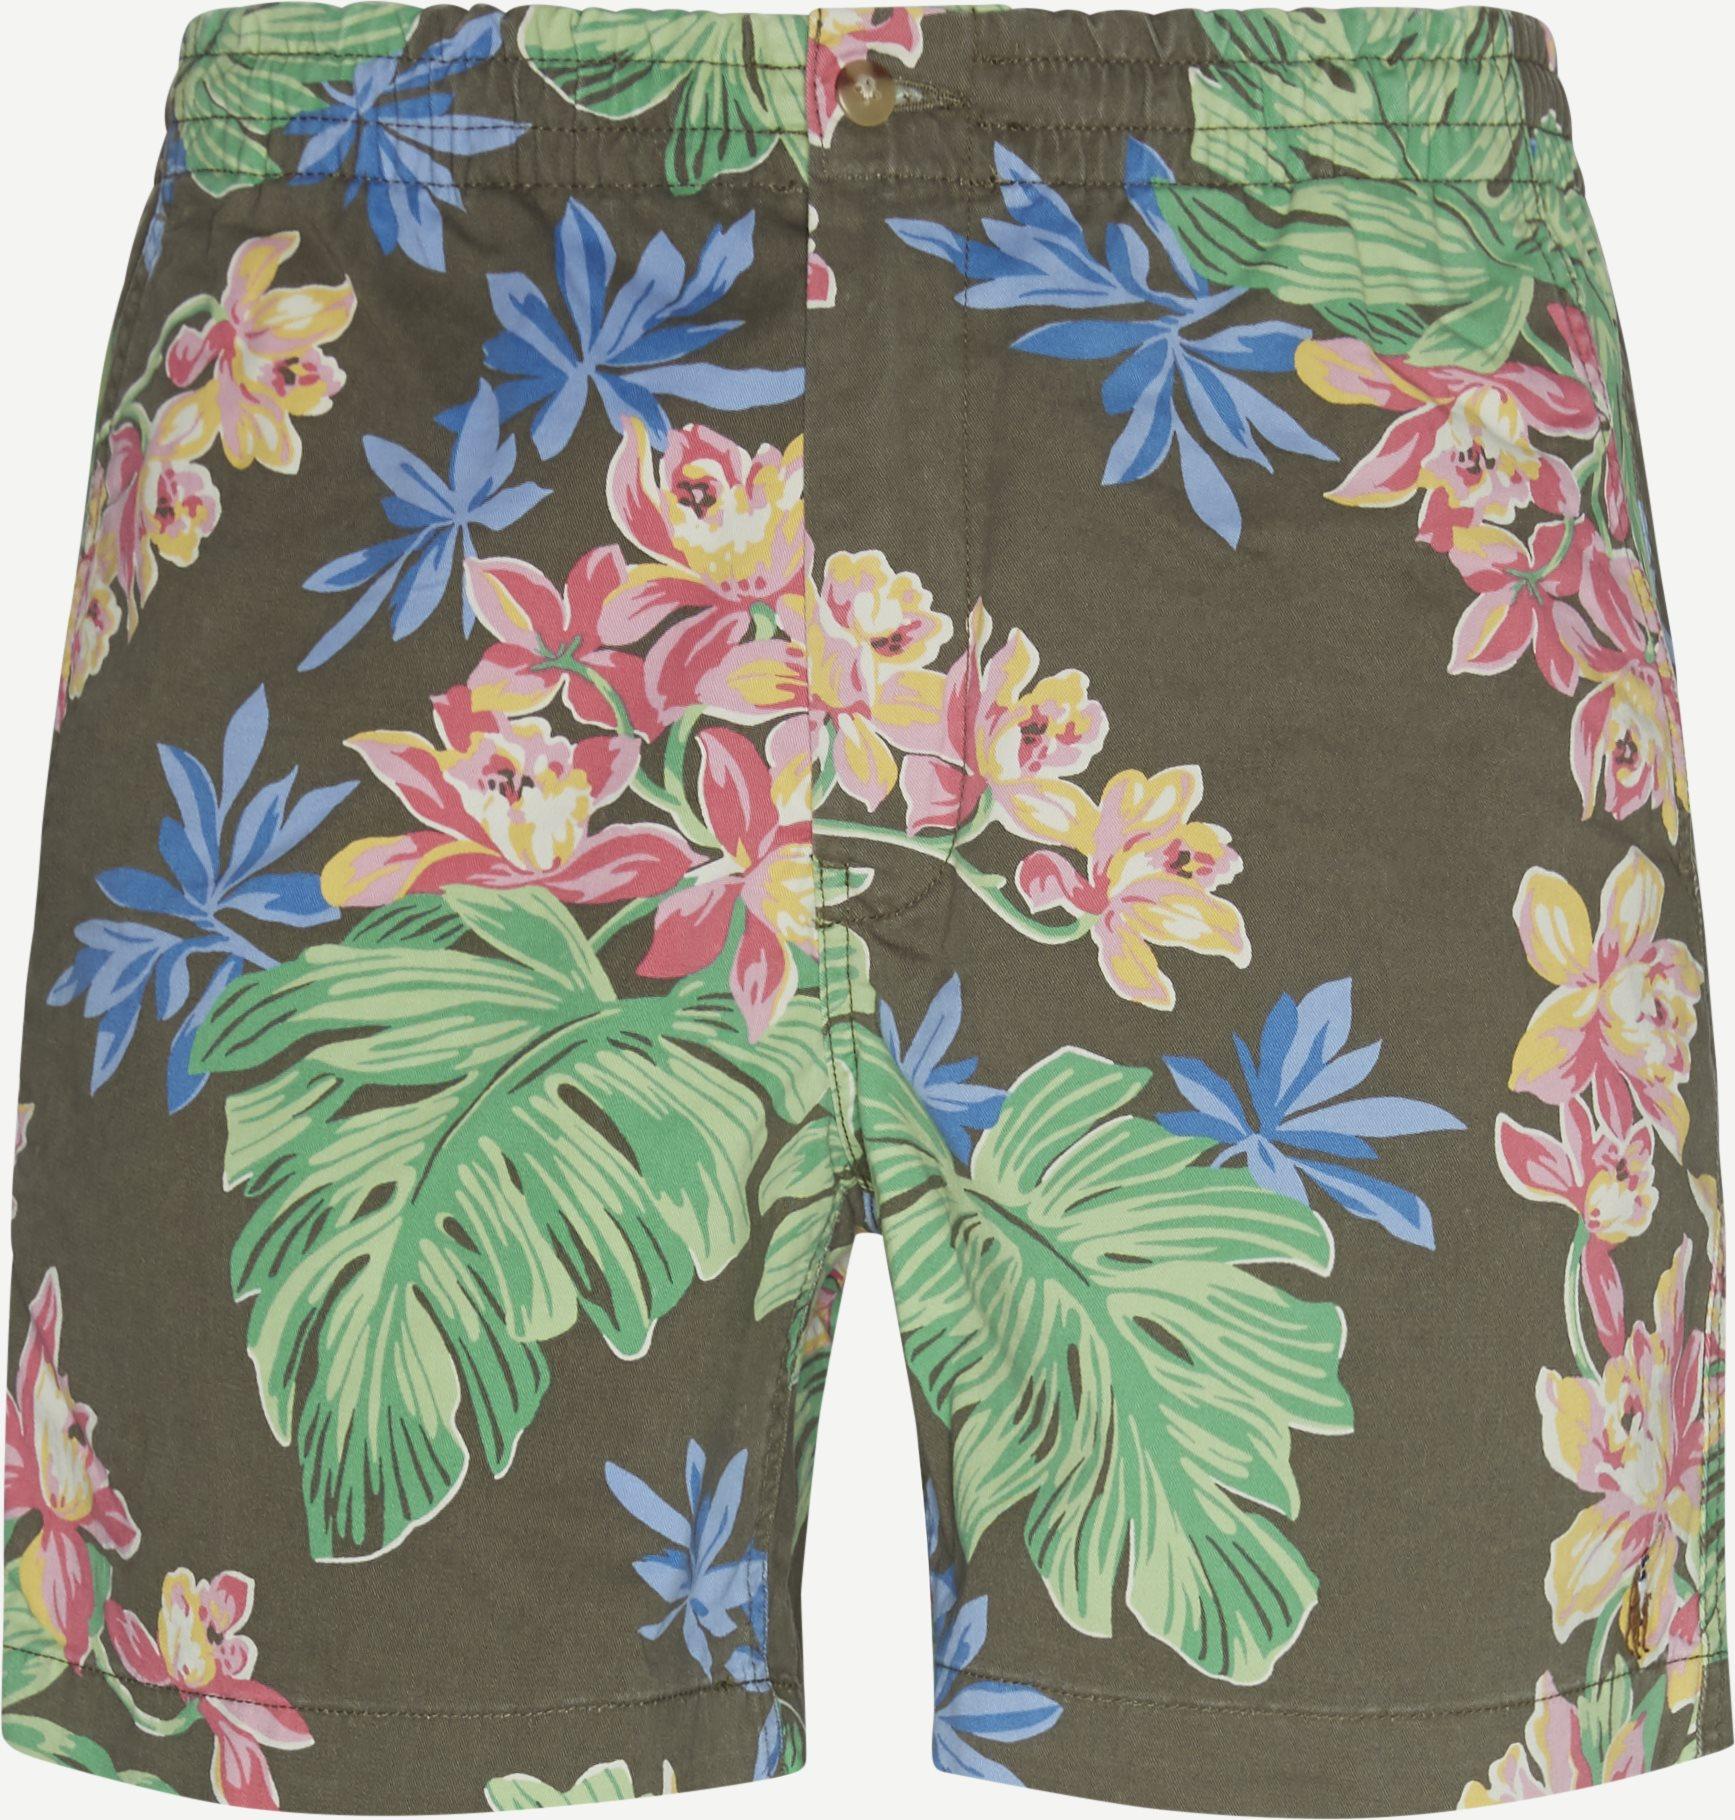 Shorts - Classic fit - Oliv